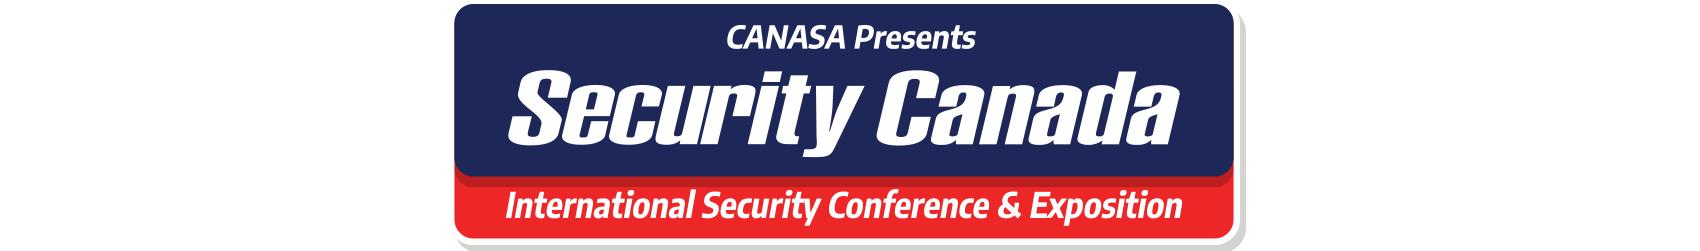 Canadian Security logo